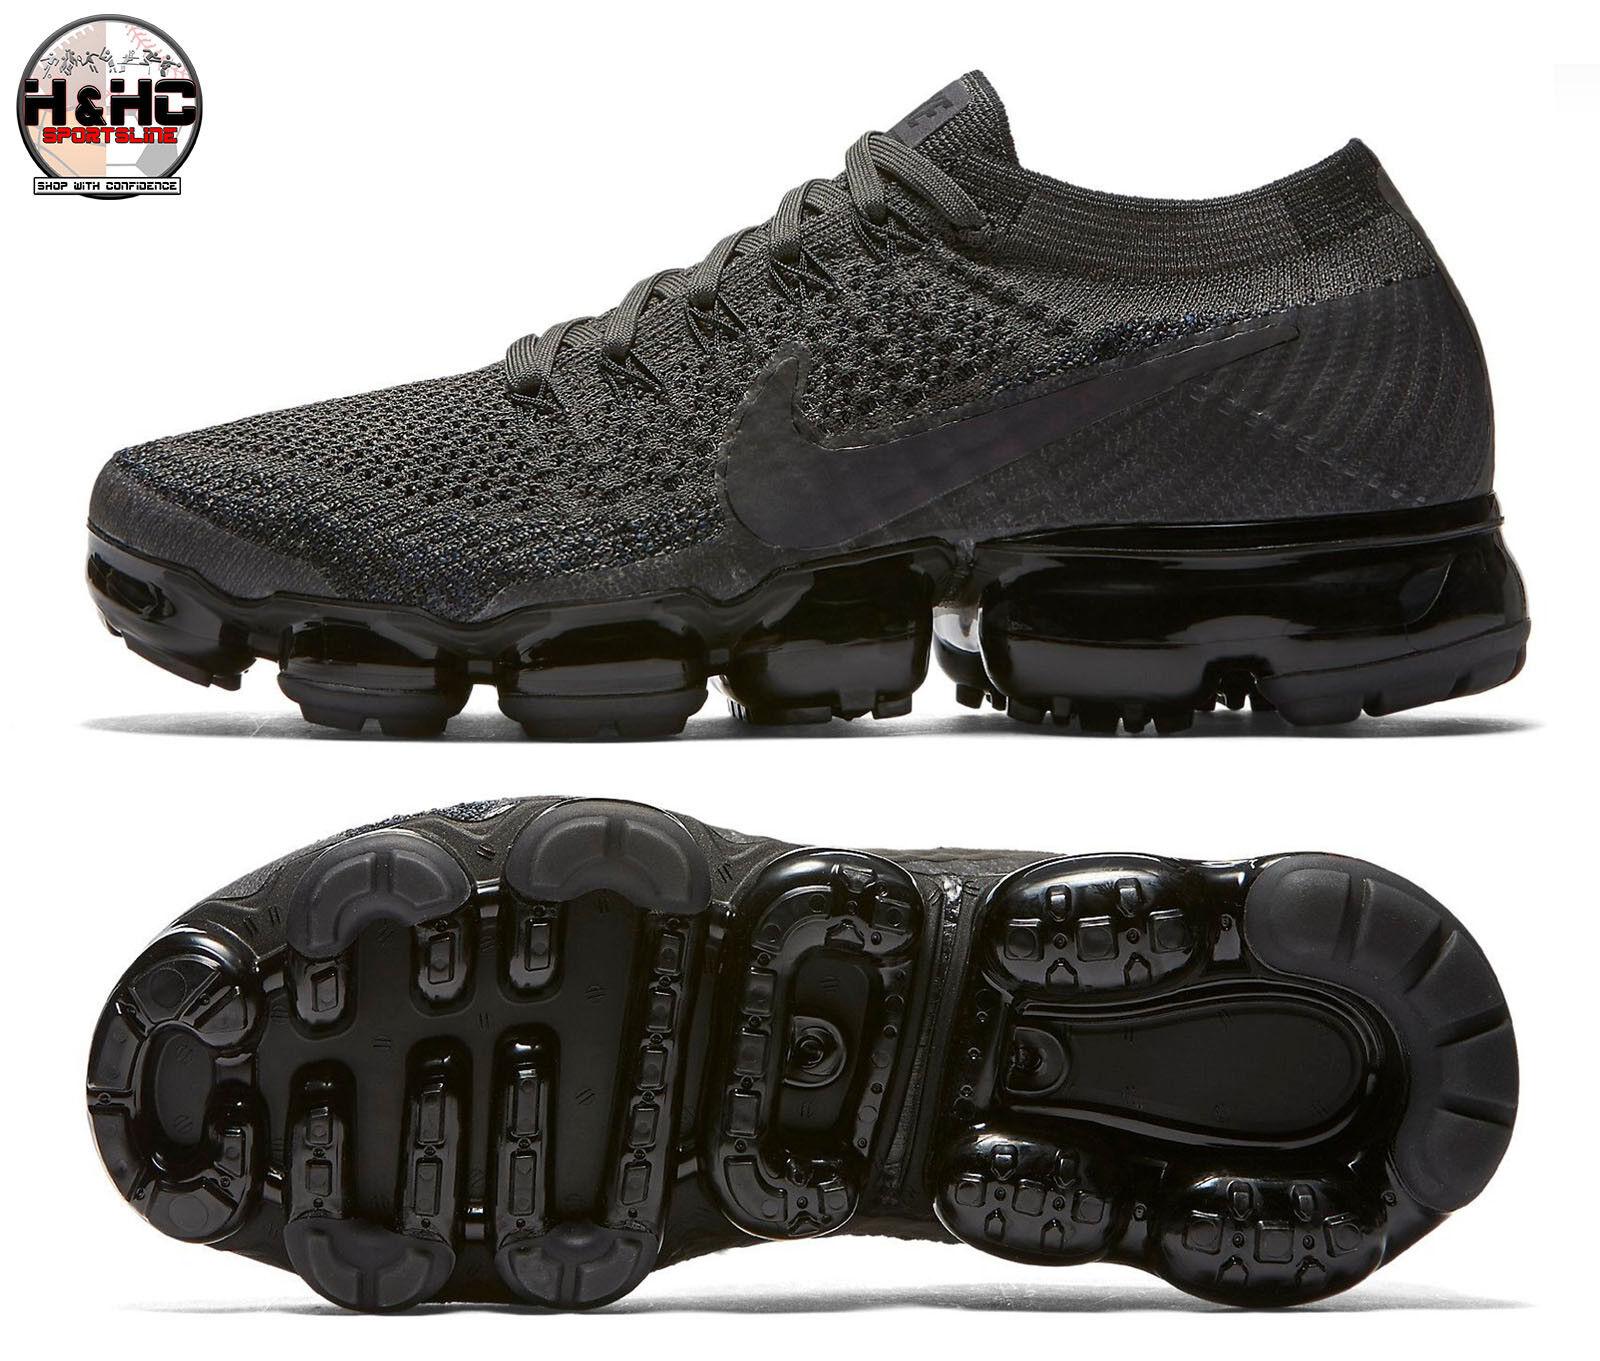 Nike air vapormax flyknit 849557 009 mezzanotte nebbia / donne nere e scarpe sz - 8